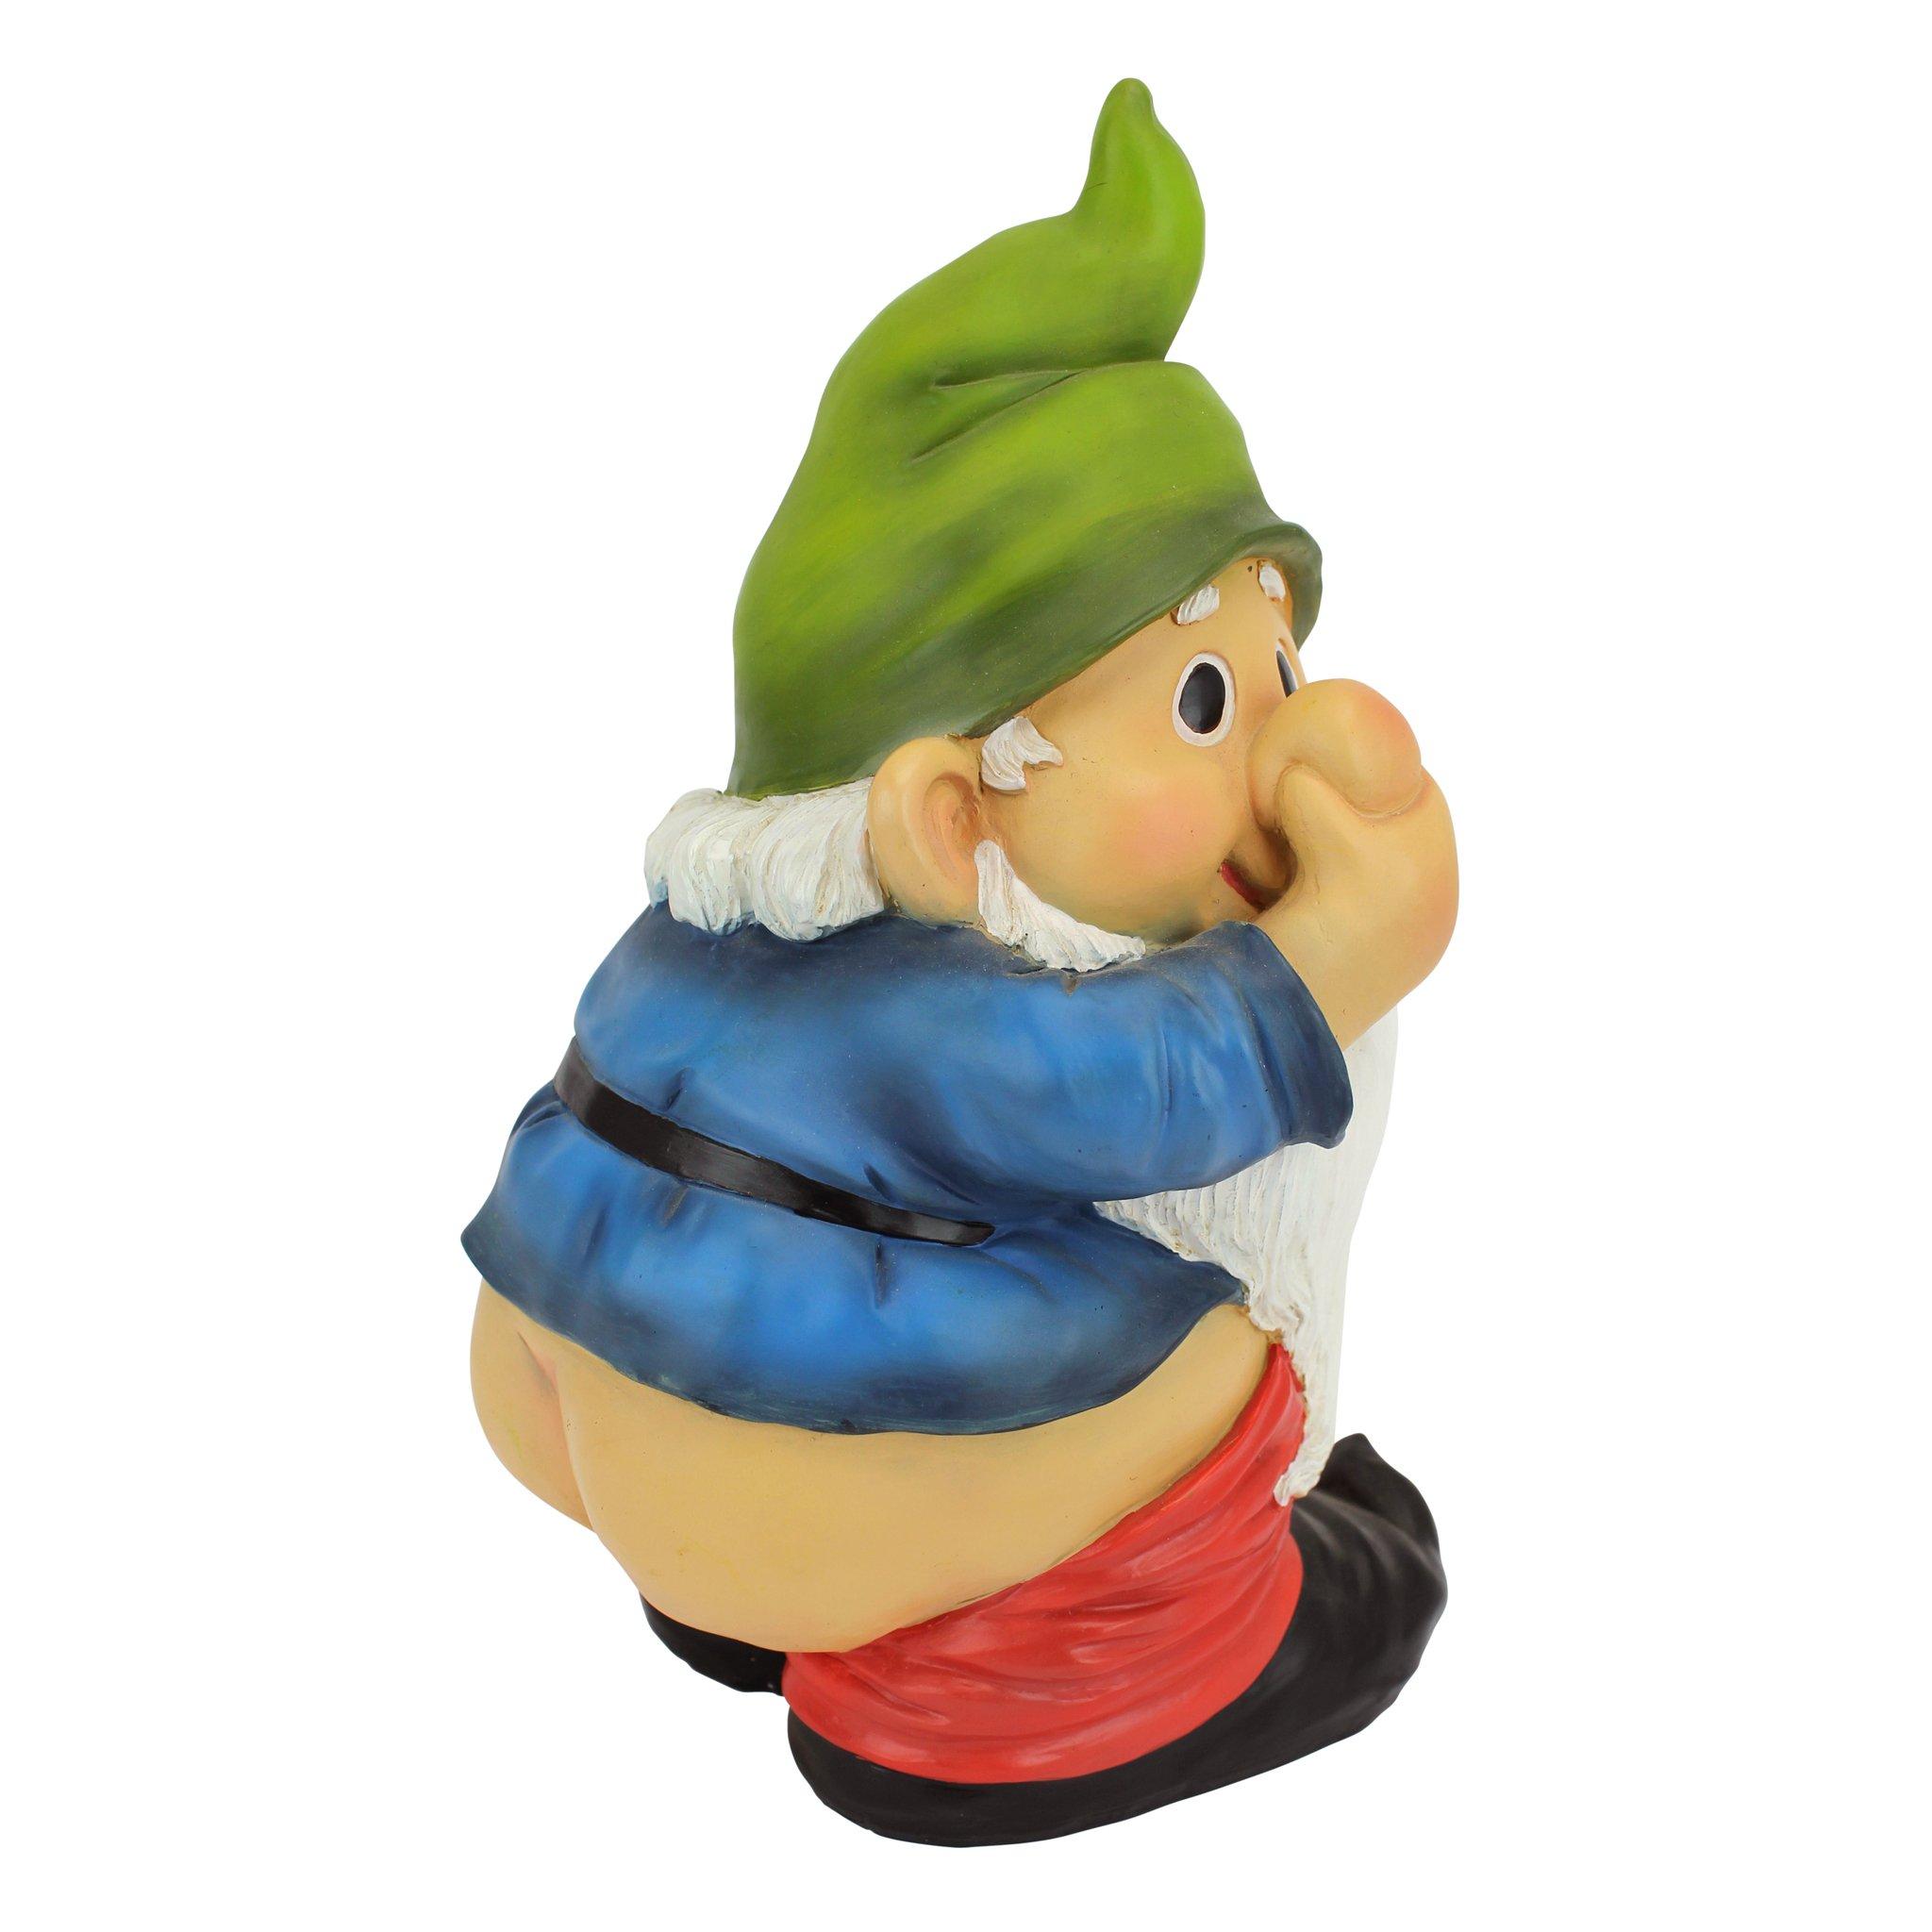 Naughty Santa Bauble Xmas Hanging Ornament for Home Decor Funny Resin Nude Gnome Ornaments 2PCS Juyuntong Naughty Wink Santa or Garden Gnome Statue